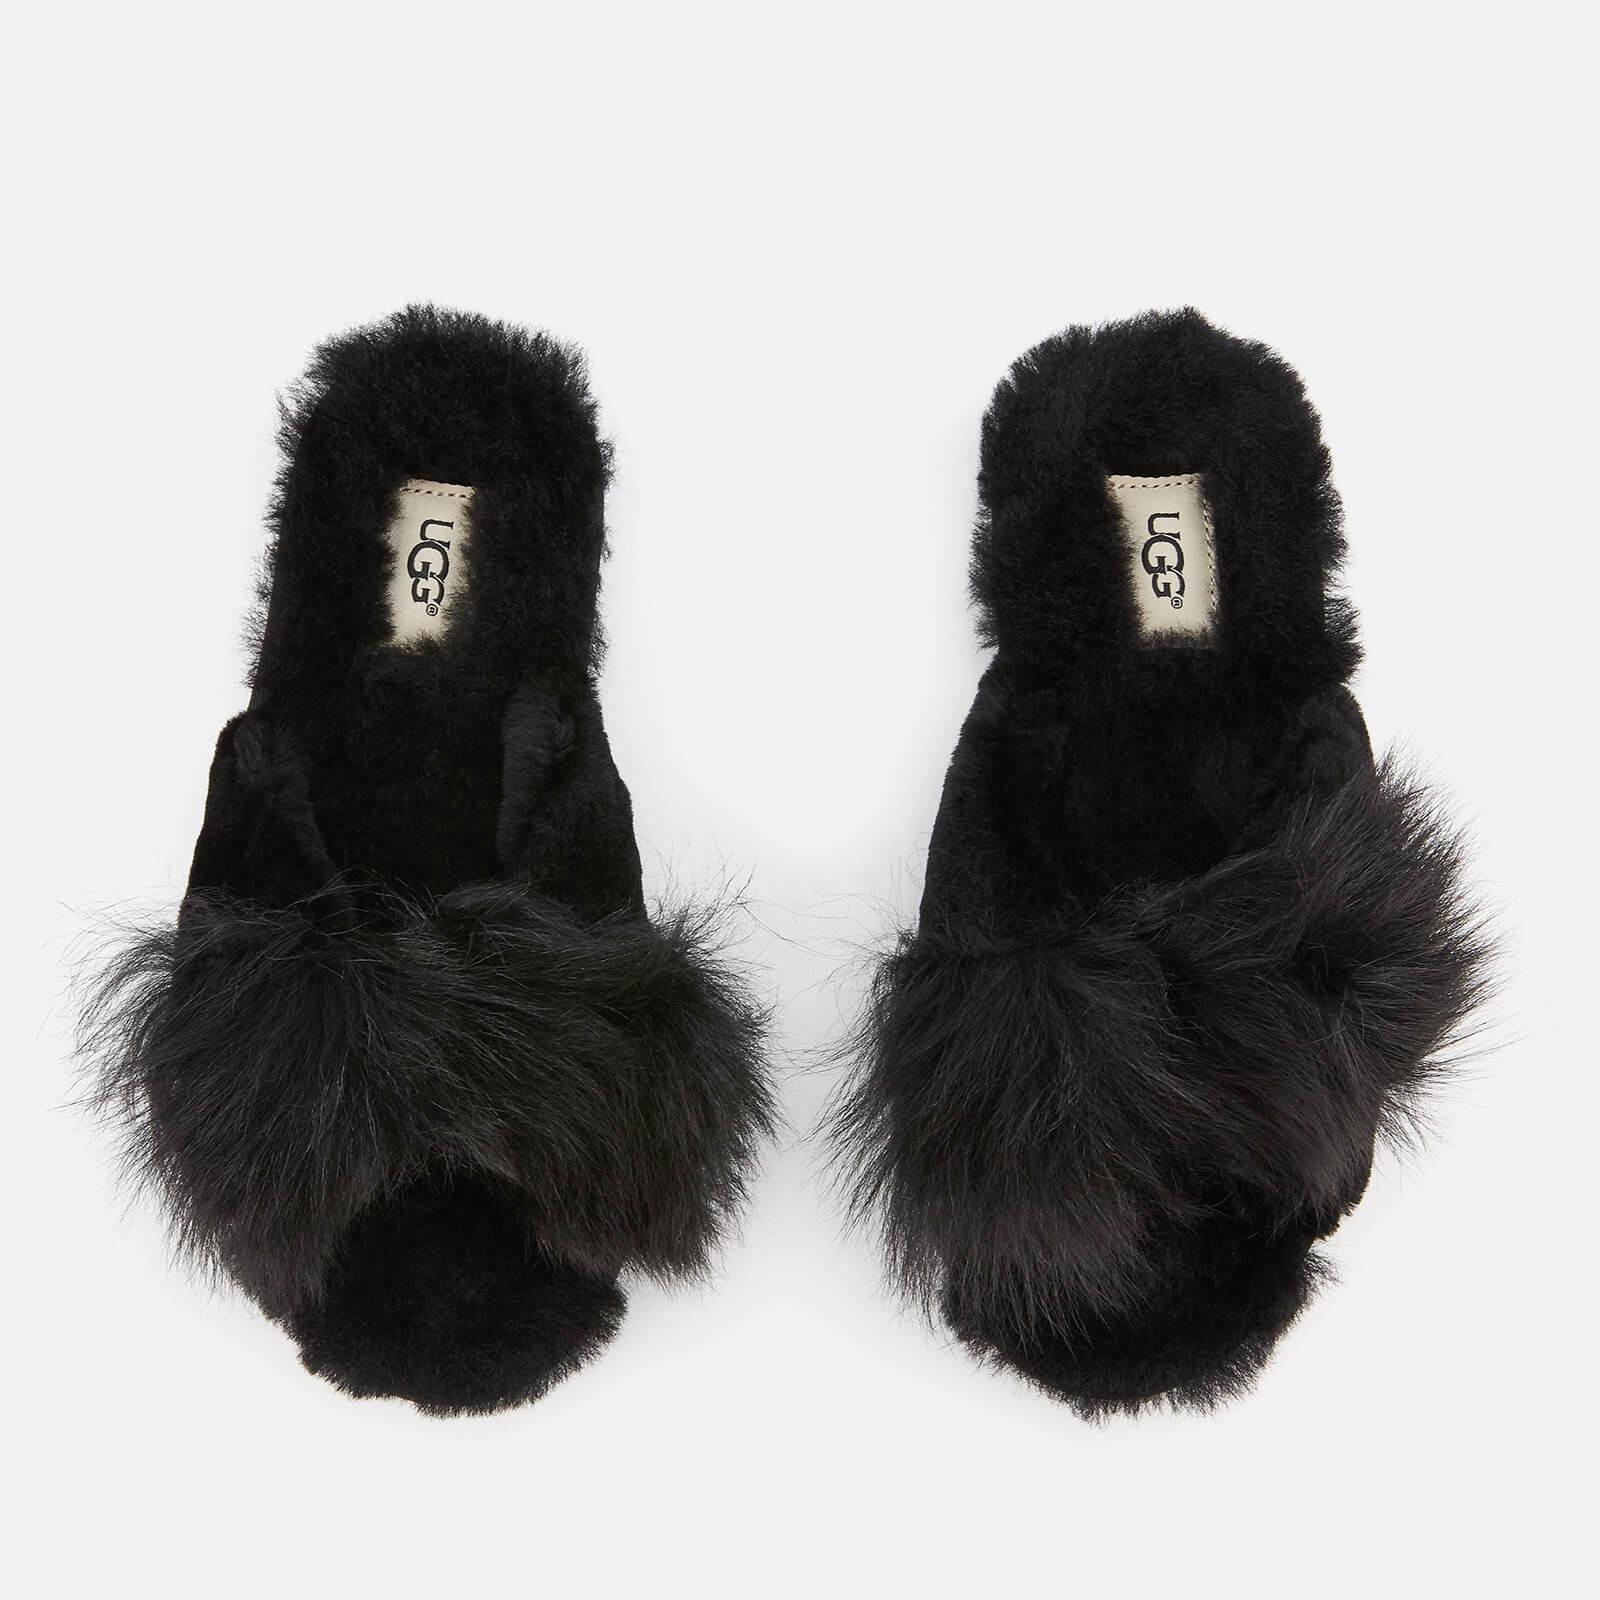 1deaf5f86ac UGG Mirabelle Sheepskin Slide Slippers in Black - Lyst